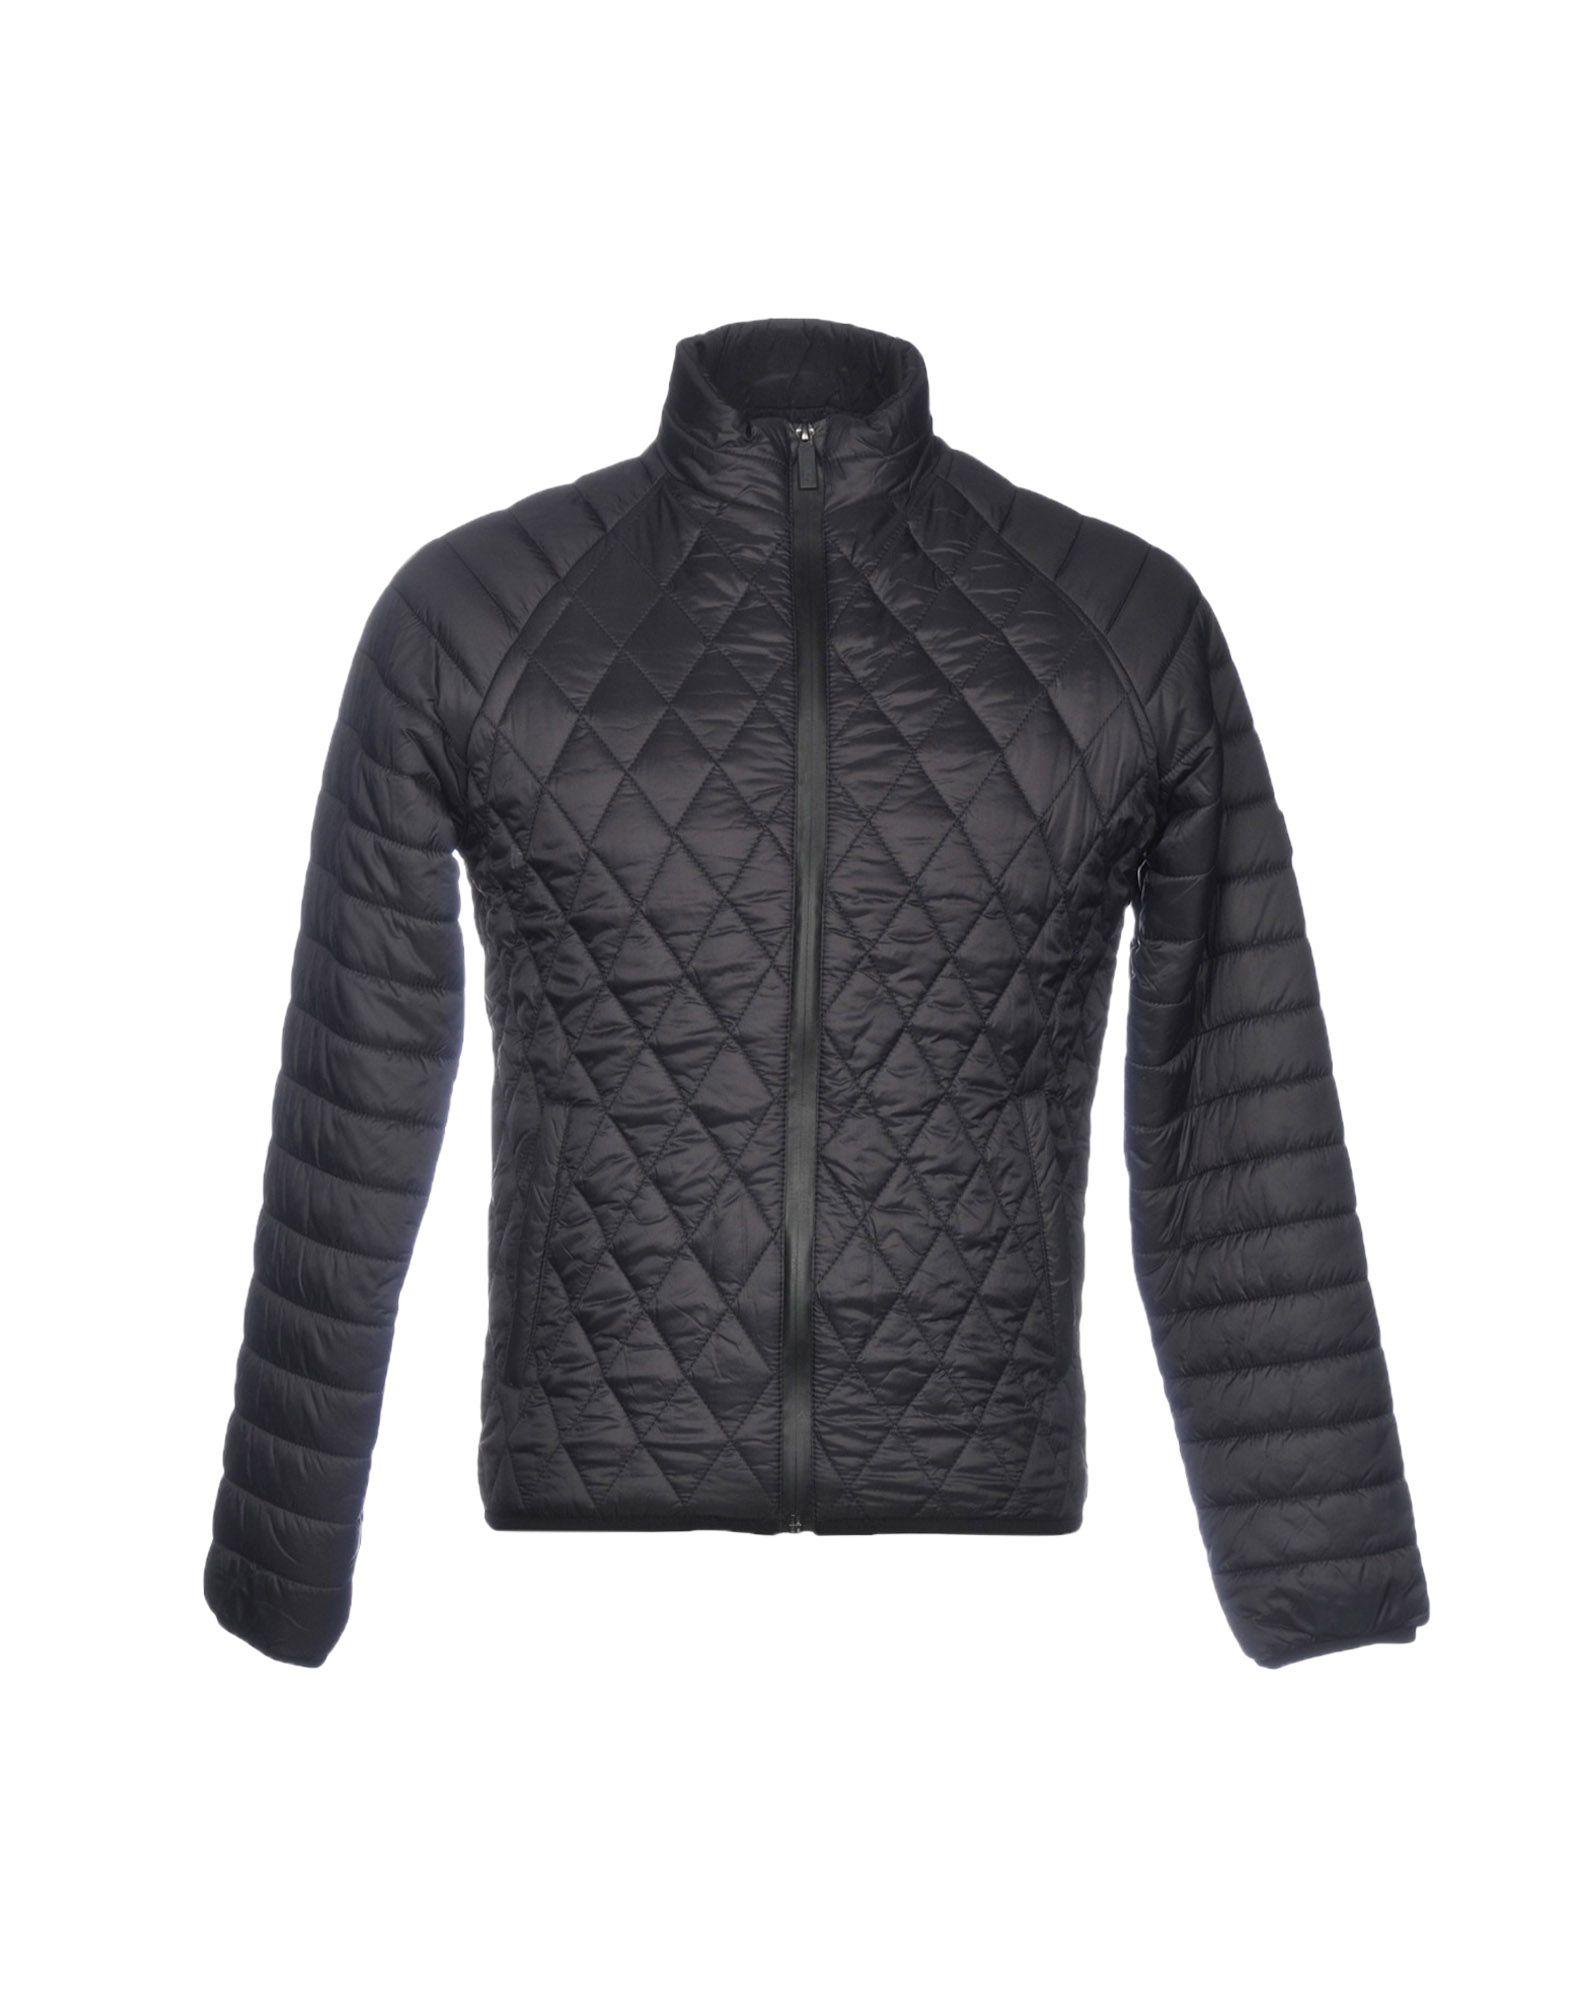 LIU JO MAN Synthetic Down Jackets - Item 41827278